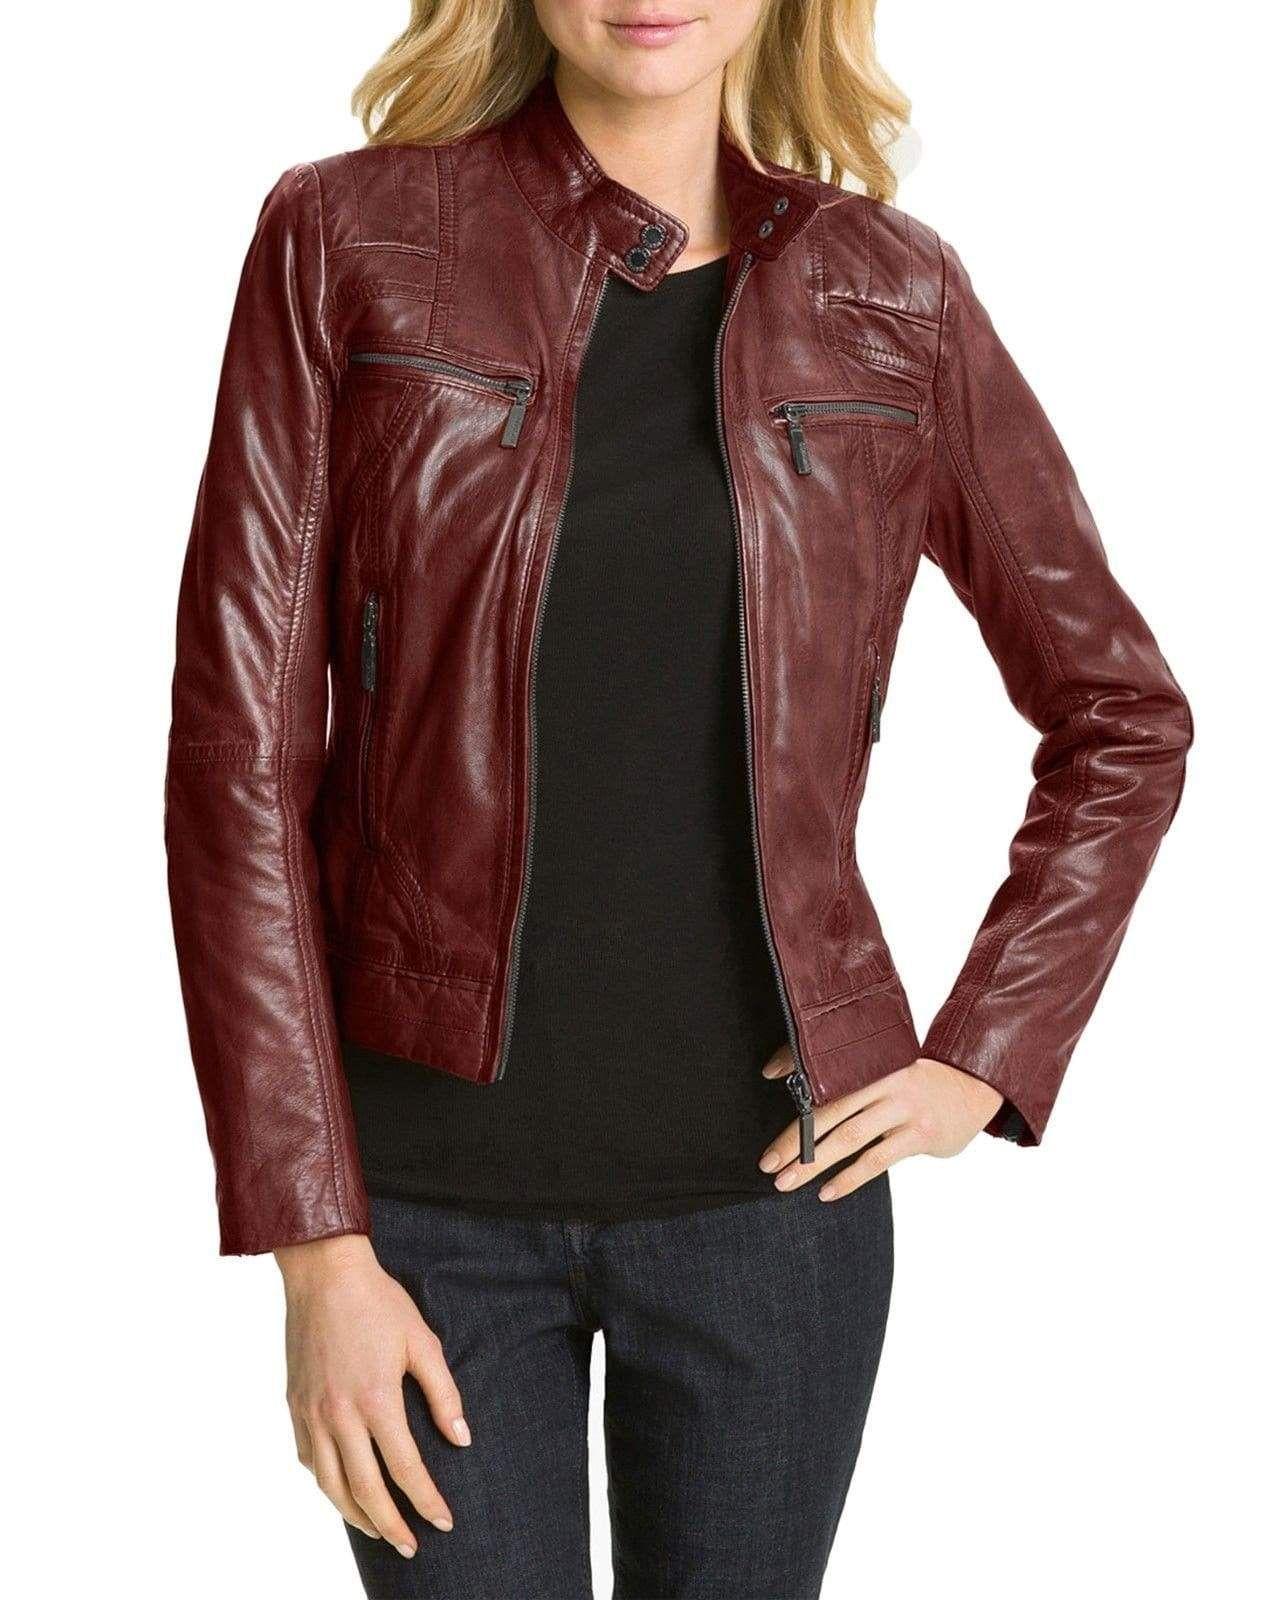 Women S Soft Leather Biker Burgundy Jacket Women S Fancy Leather Jacket In 2021 Jackets For Women Leather Jackets Women Burgundy Jacket [ 1600 x 1287 Pixel ]